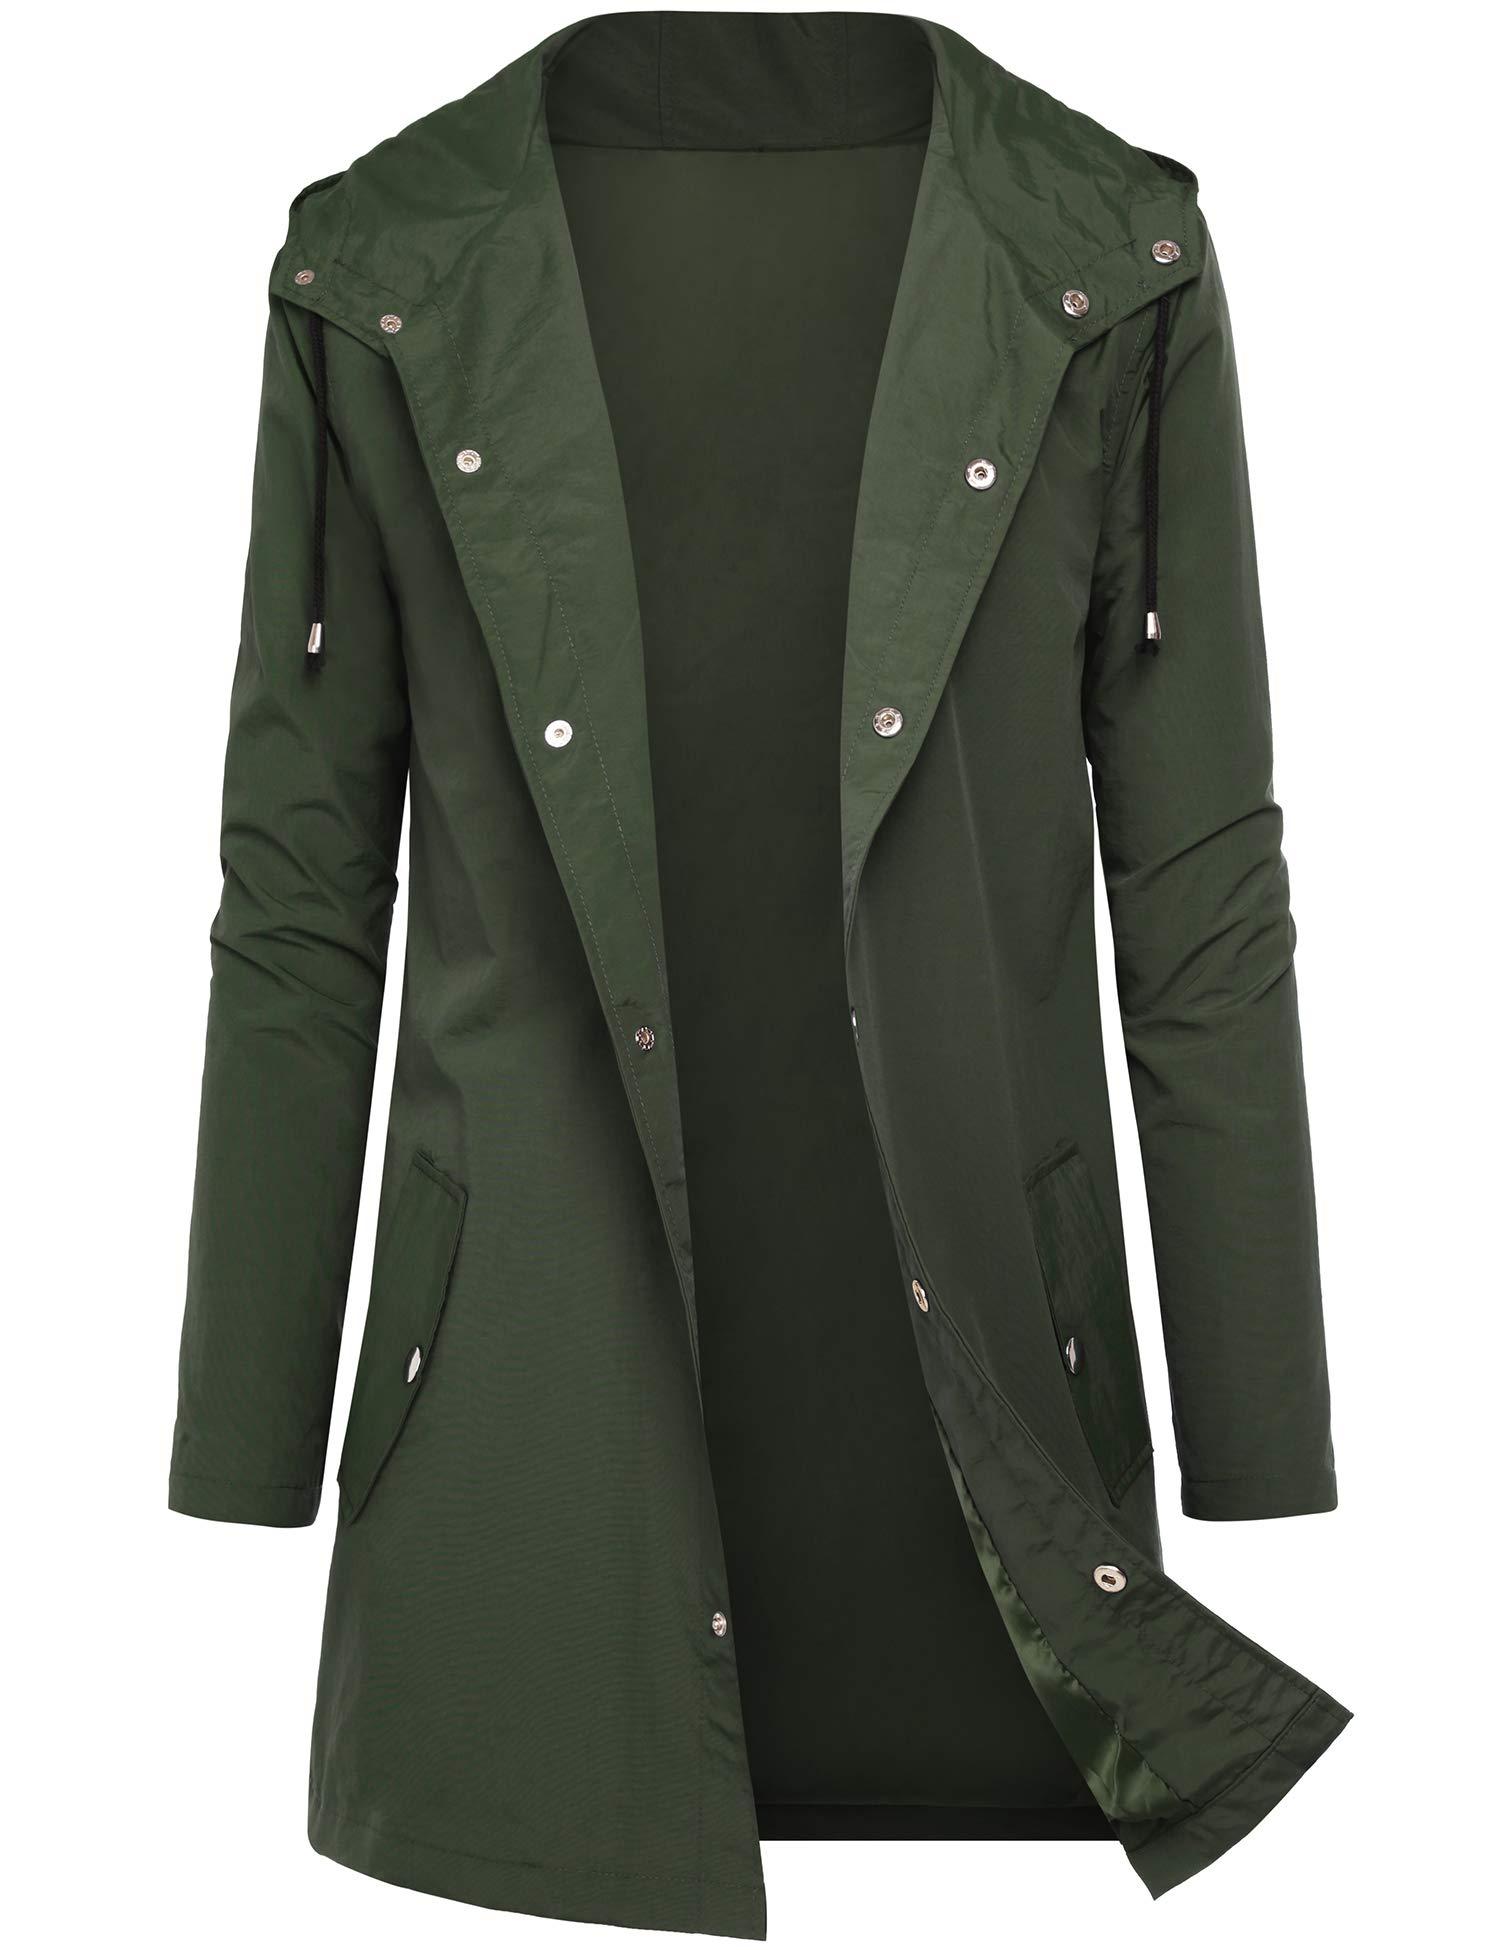 DOSWODE Men Waterproof Raincoat Hooded Windbreaker Lightweight Long Rain Jacket Active Outdoor Trench Green_XL by DOSWODE